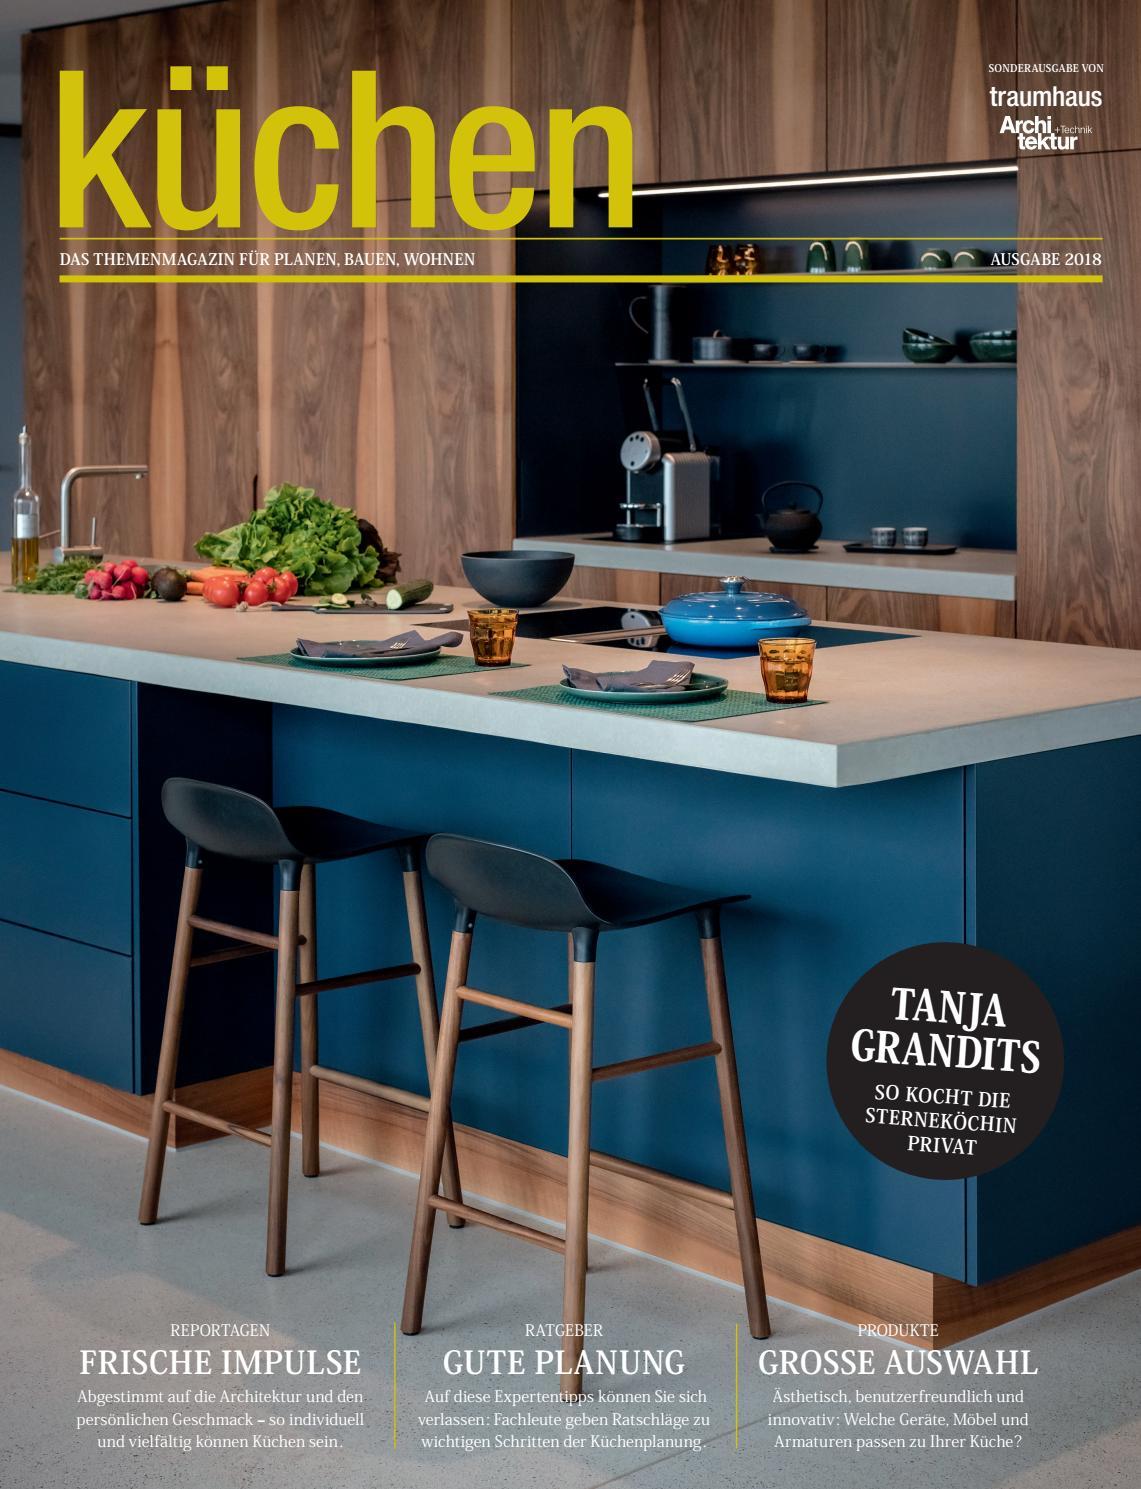 Traumhaus Kuchen 2018 By Bl Verlag Ag Issuu